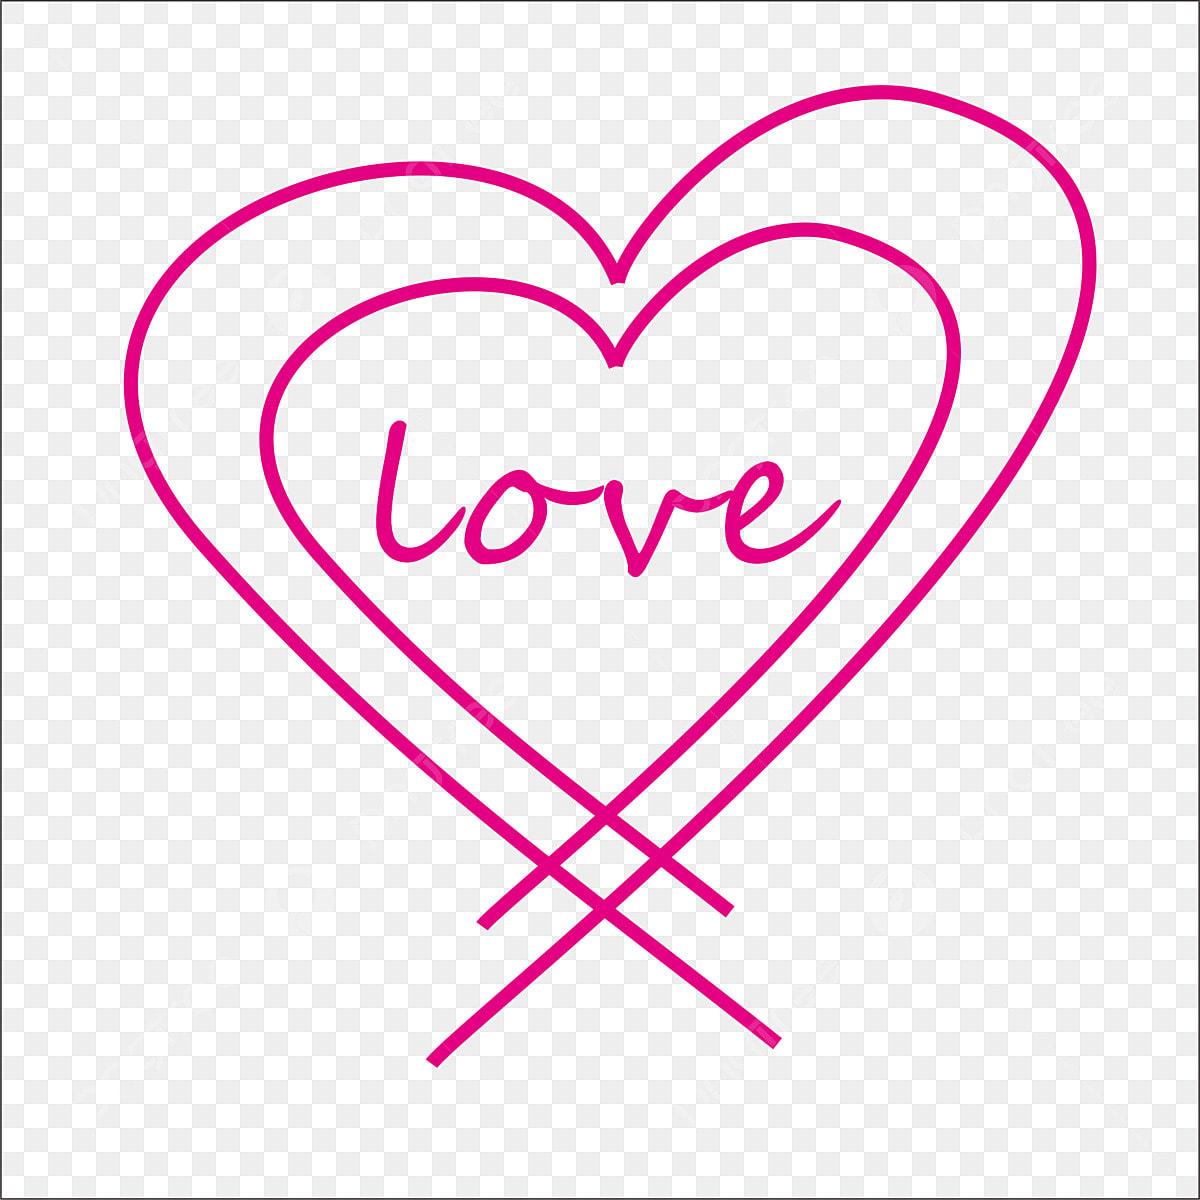 Dibujos Animados Dibujo Lineal Amor Rosa Amor De Dibujos Animados